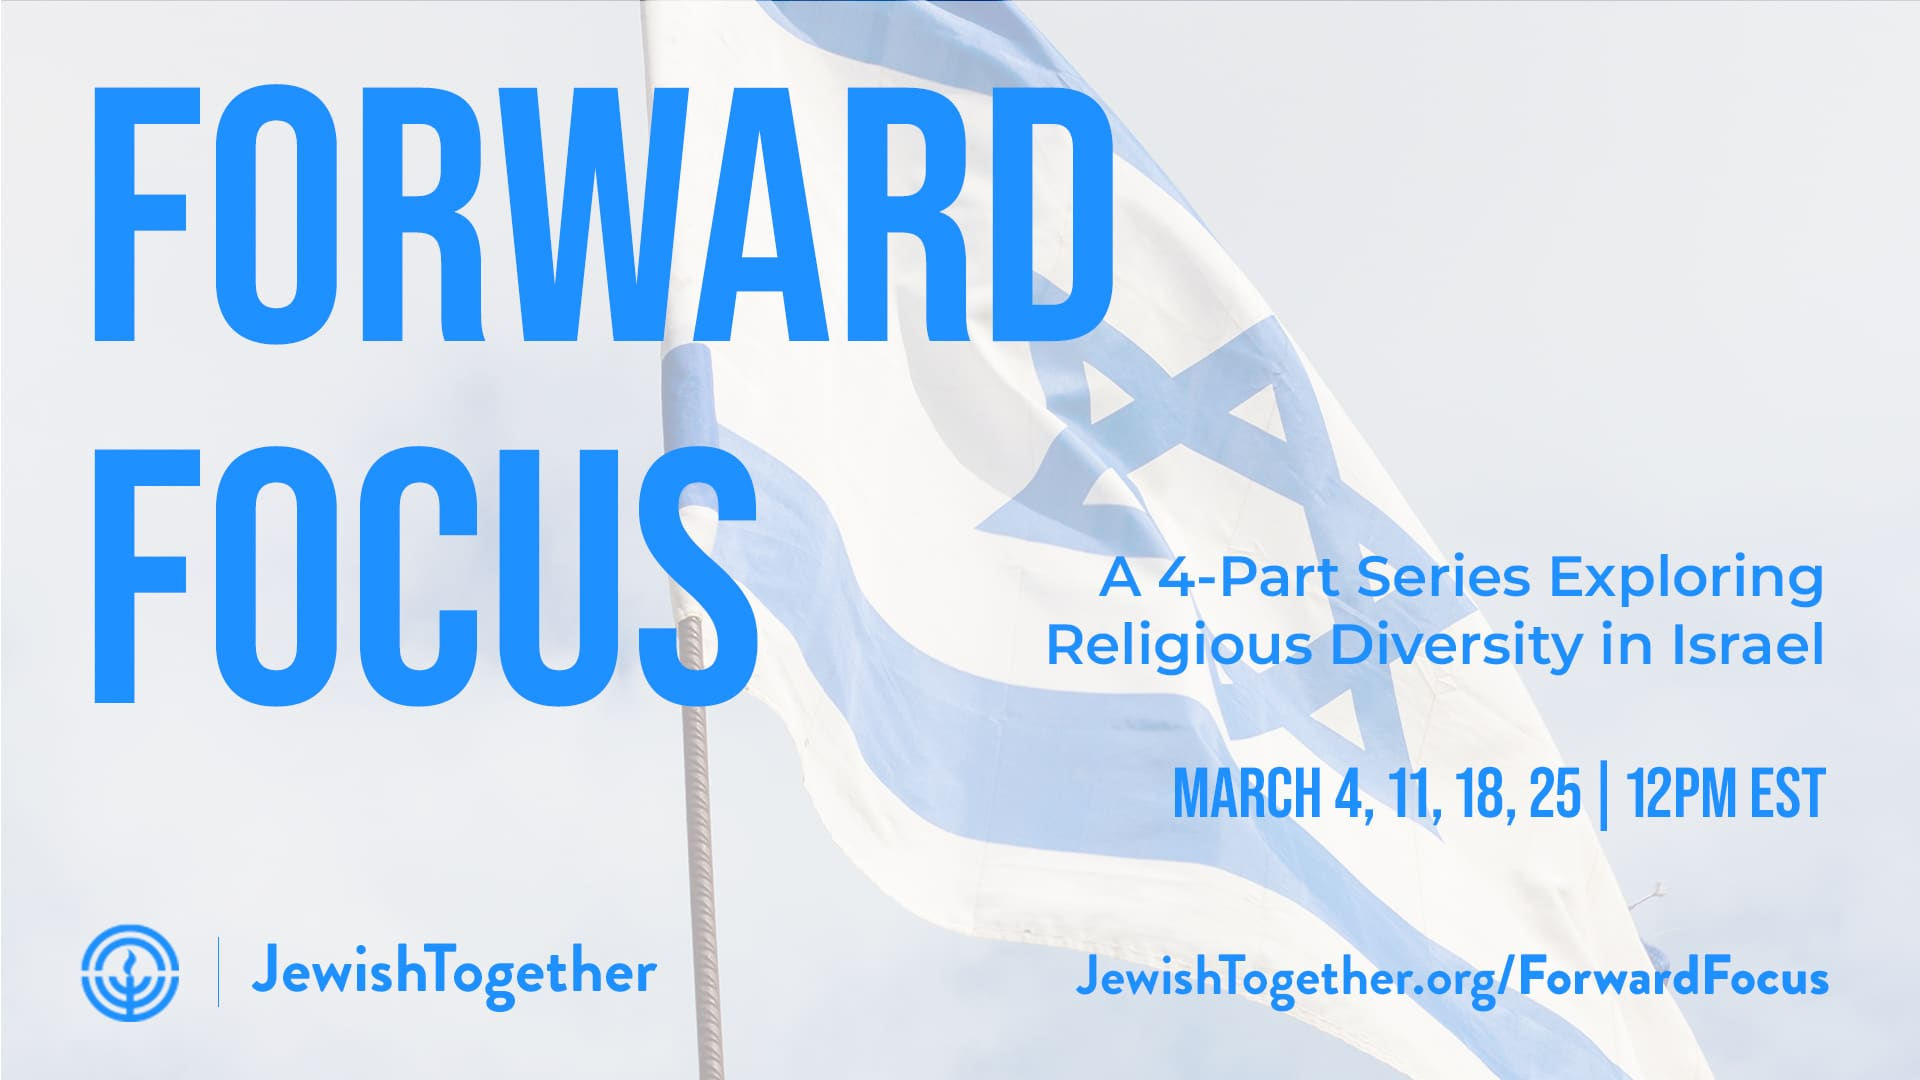 2021 Israel Mission Web Banners 1920x1080 (1)